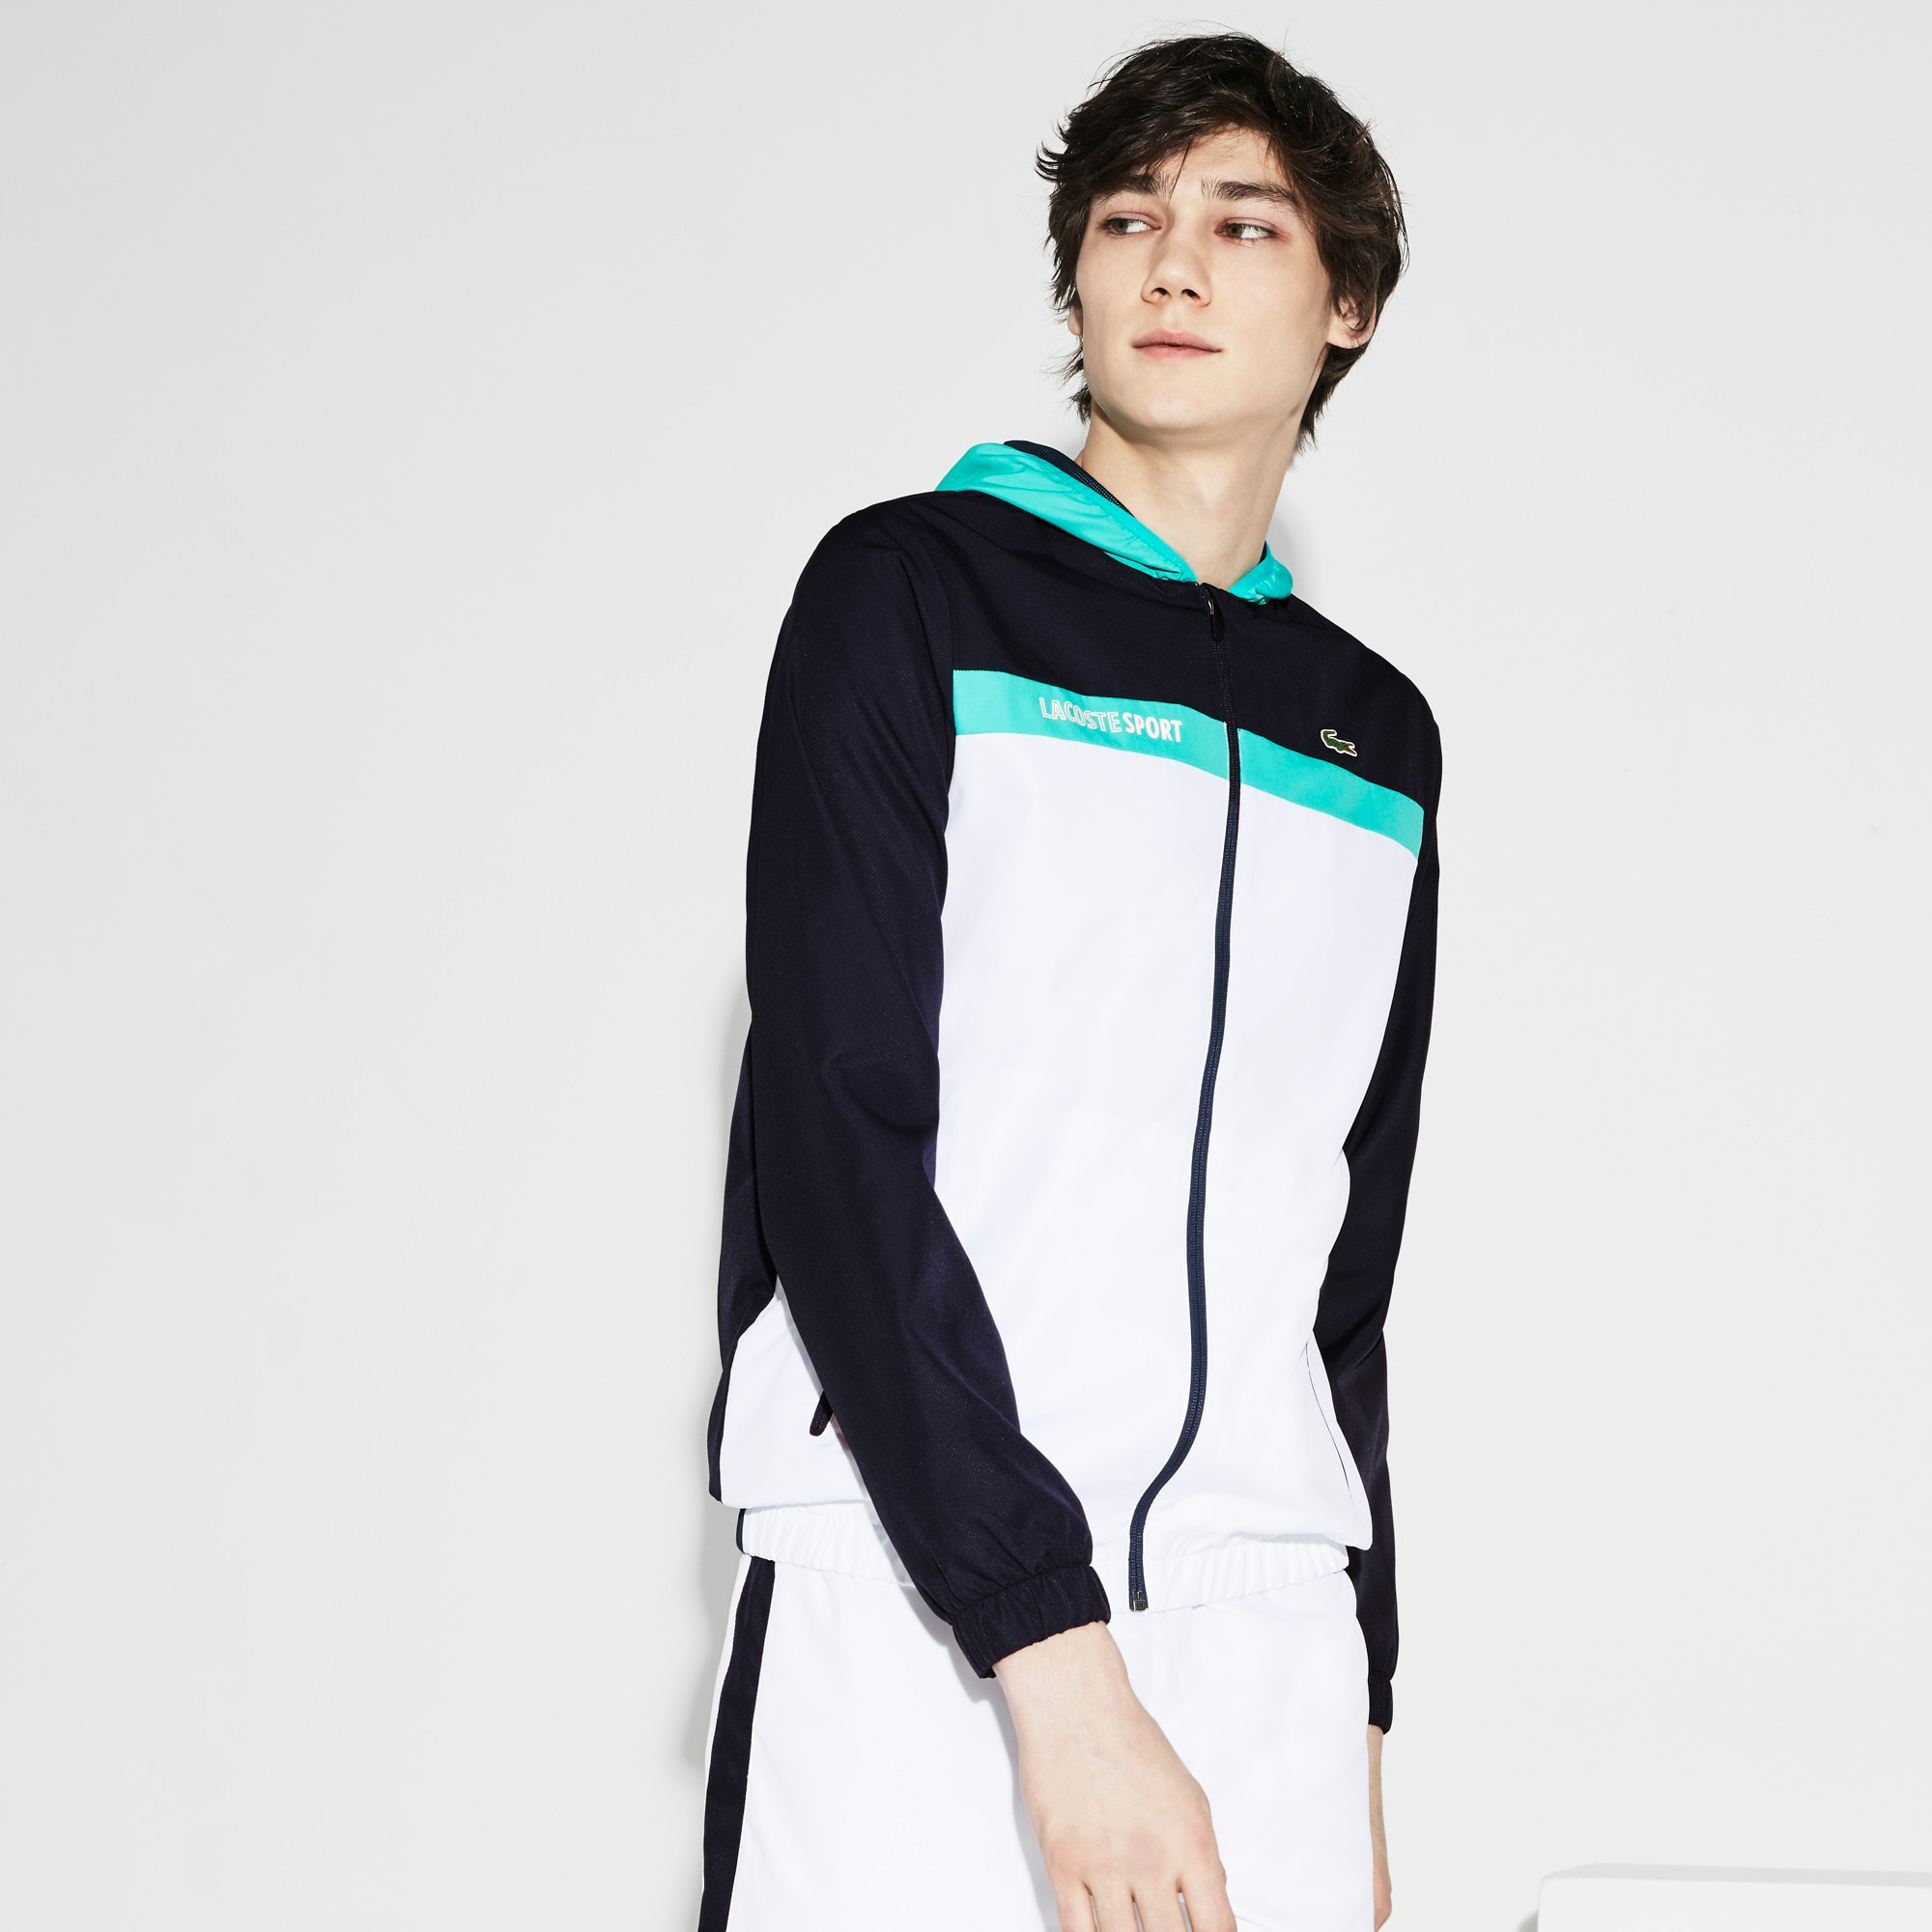 Qpfacwkqry Amp; Blousons Vestes Sport Vêtements Homme Lacoste Zqpzxwyv vm0Nn8w